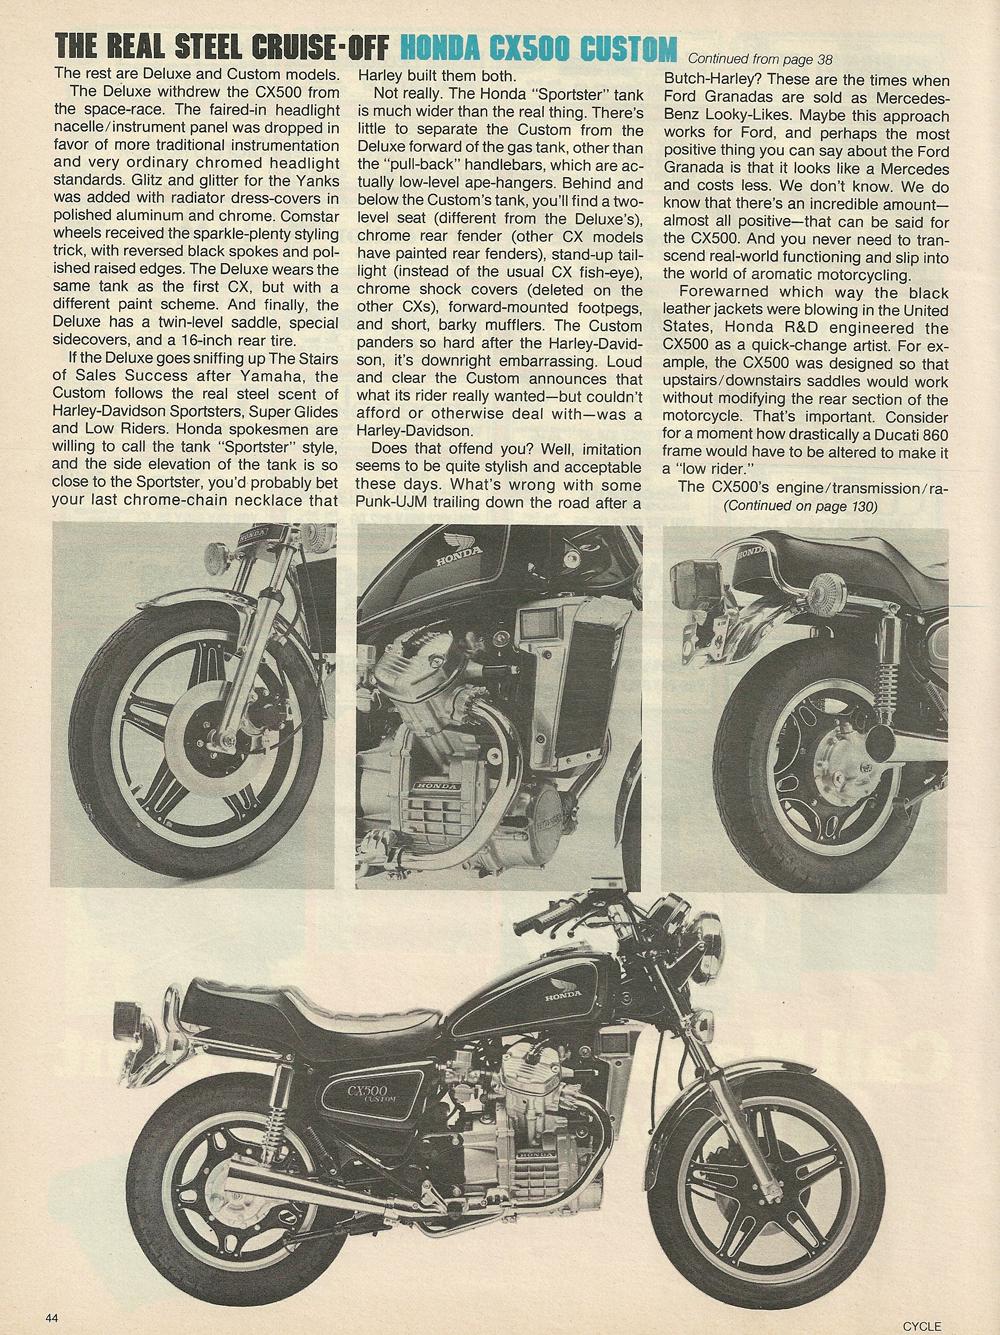 1979 Honda CX500 vs Harley FXS-80 Lowrider 6.jpg